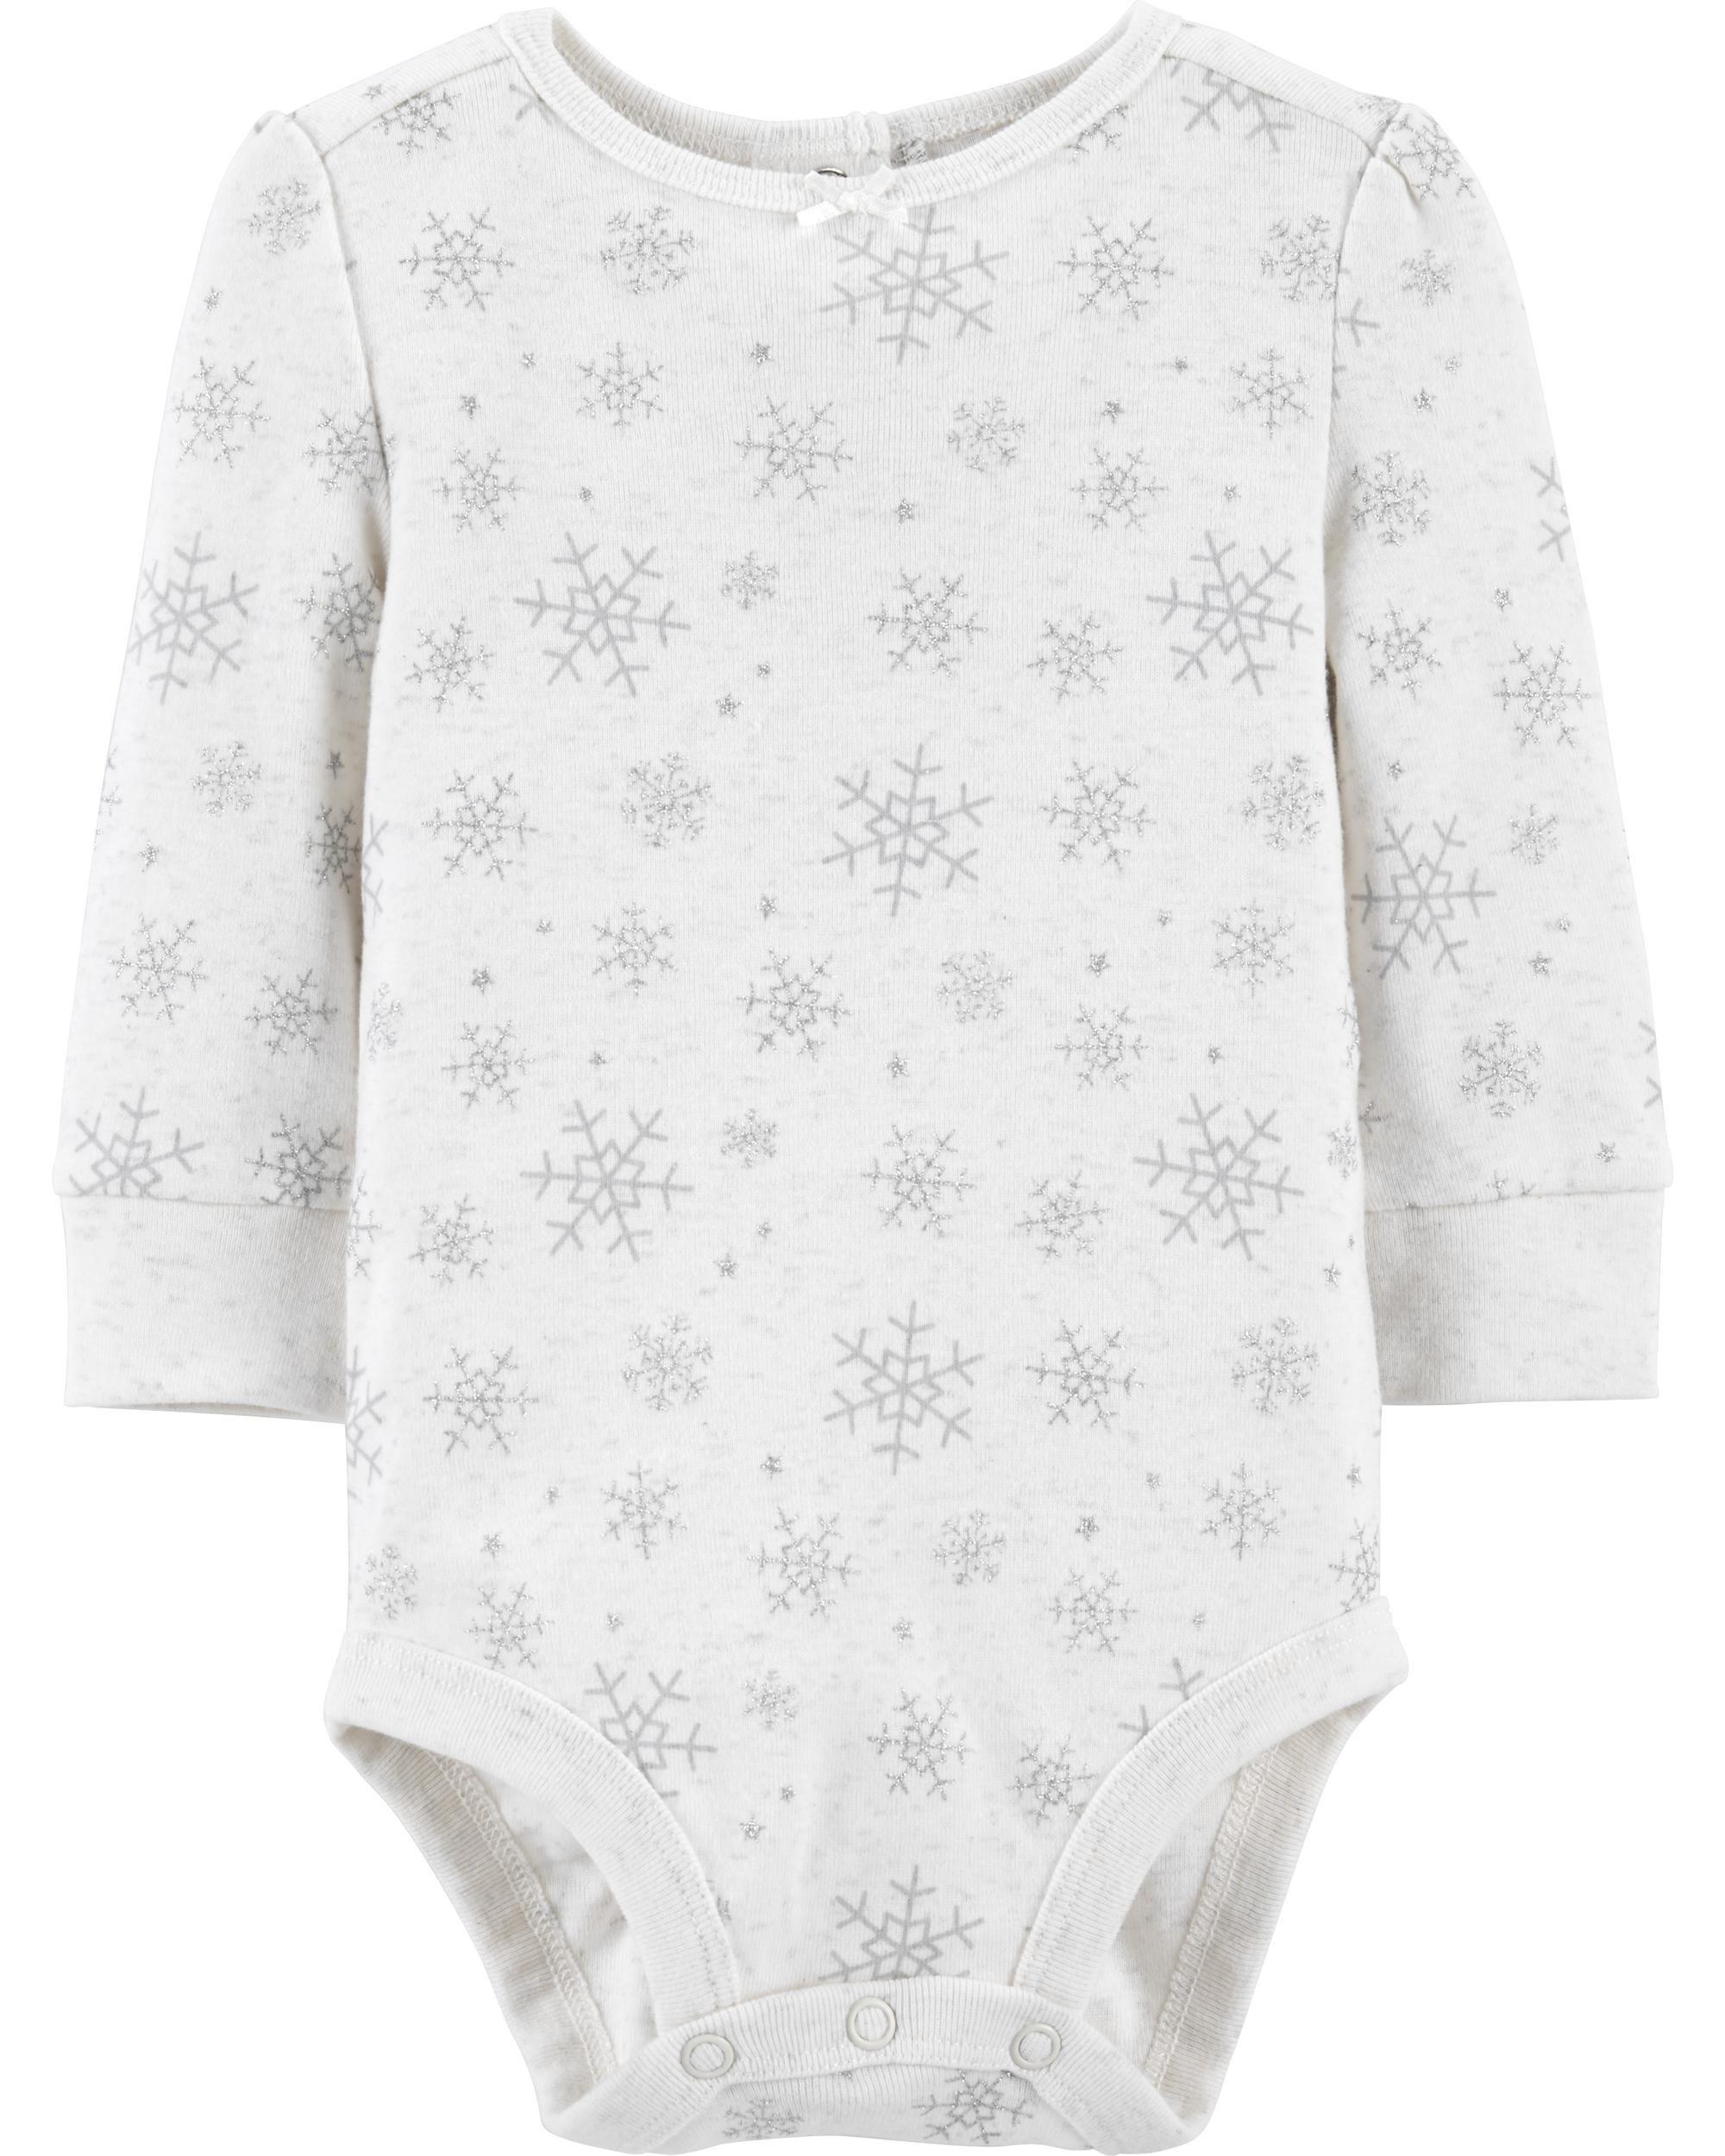 OshKosh B'gosh Girls Bodysuit 0-3 Months White layered Lace Shoulder Sleeves